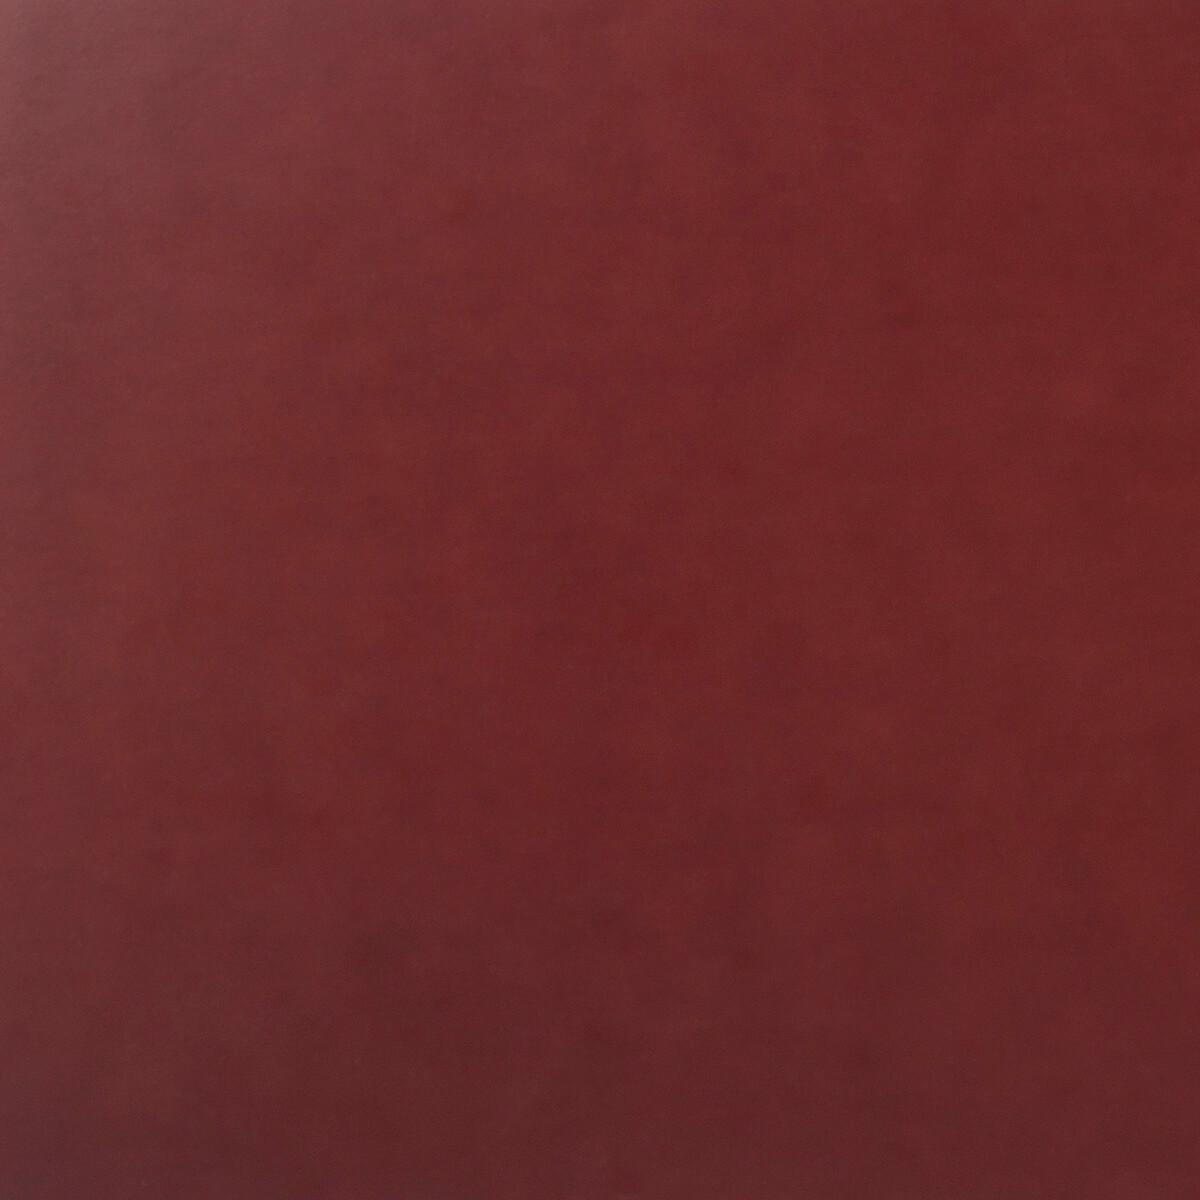 Brown Hotmark Revolution HTV - Large Roll